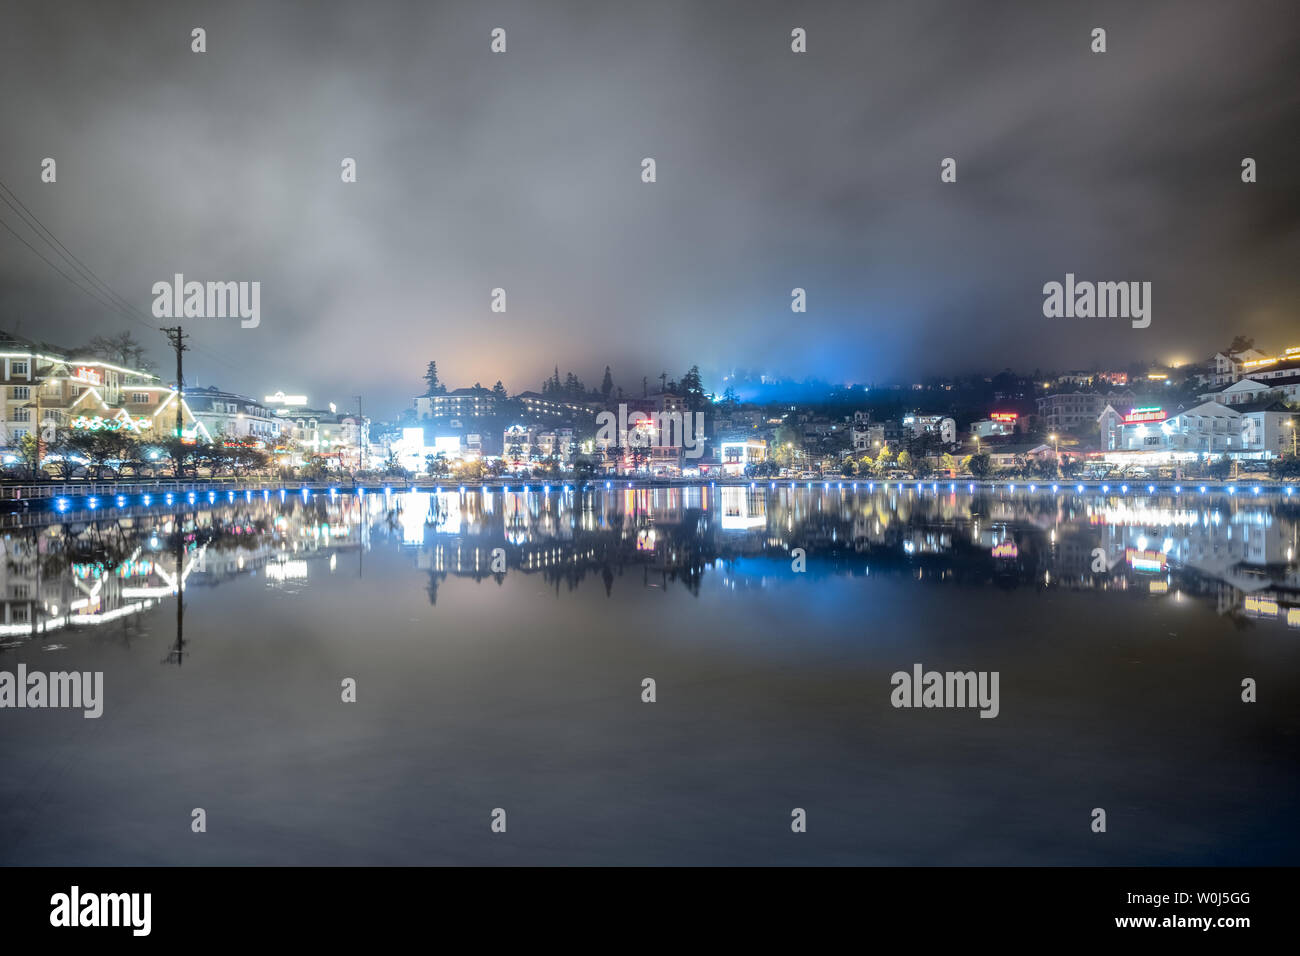 Sapa, Vietnam : Sep 07 2017 : Viewpoint city lighting decoration in lagoon foggy at night - Stock Image